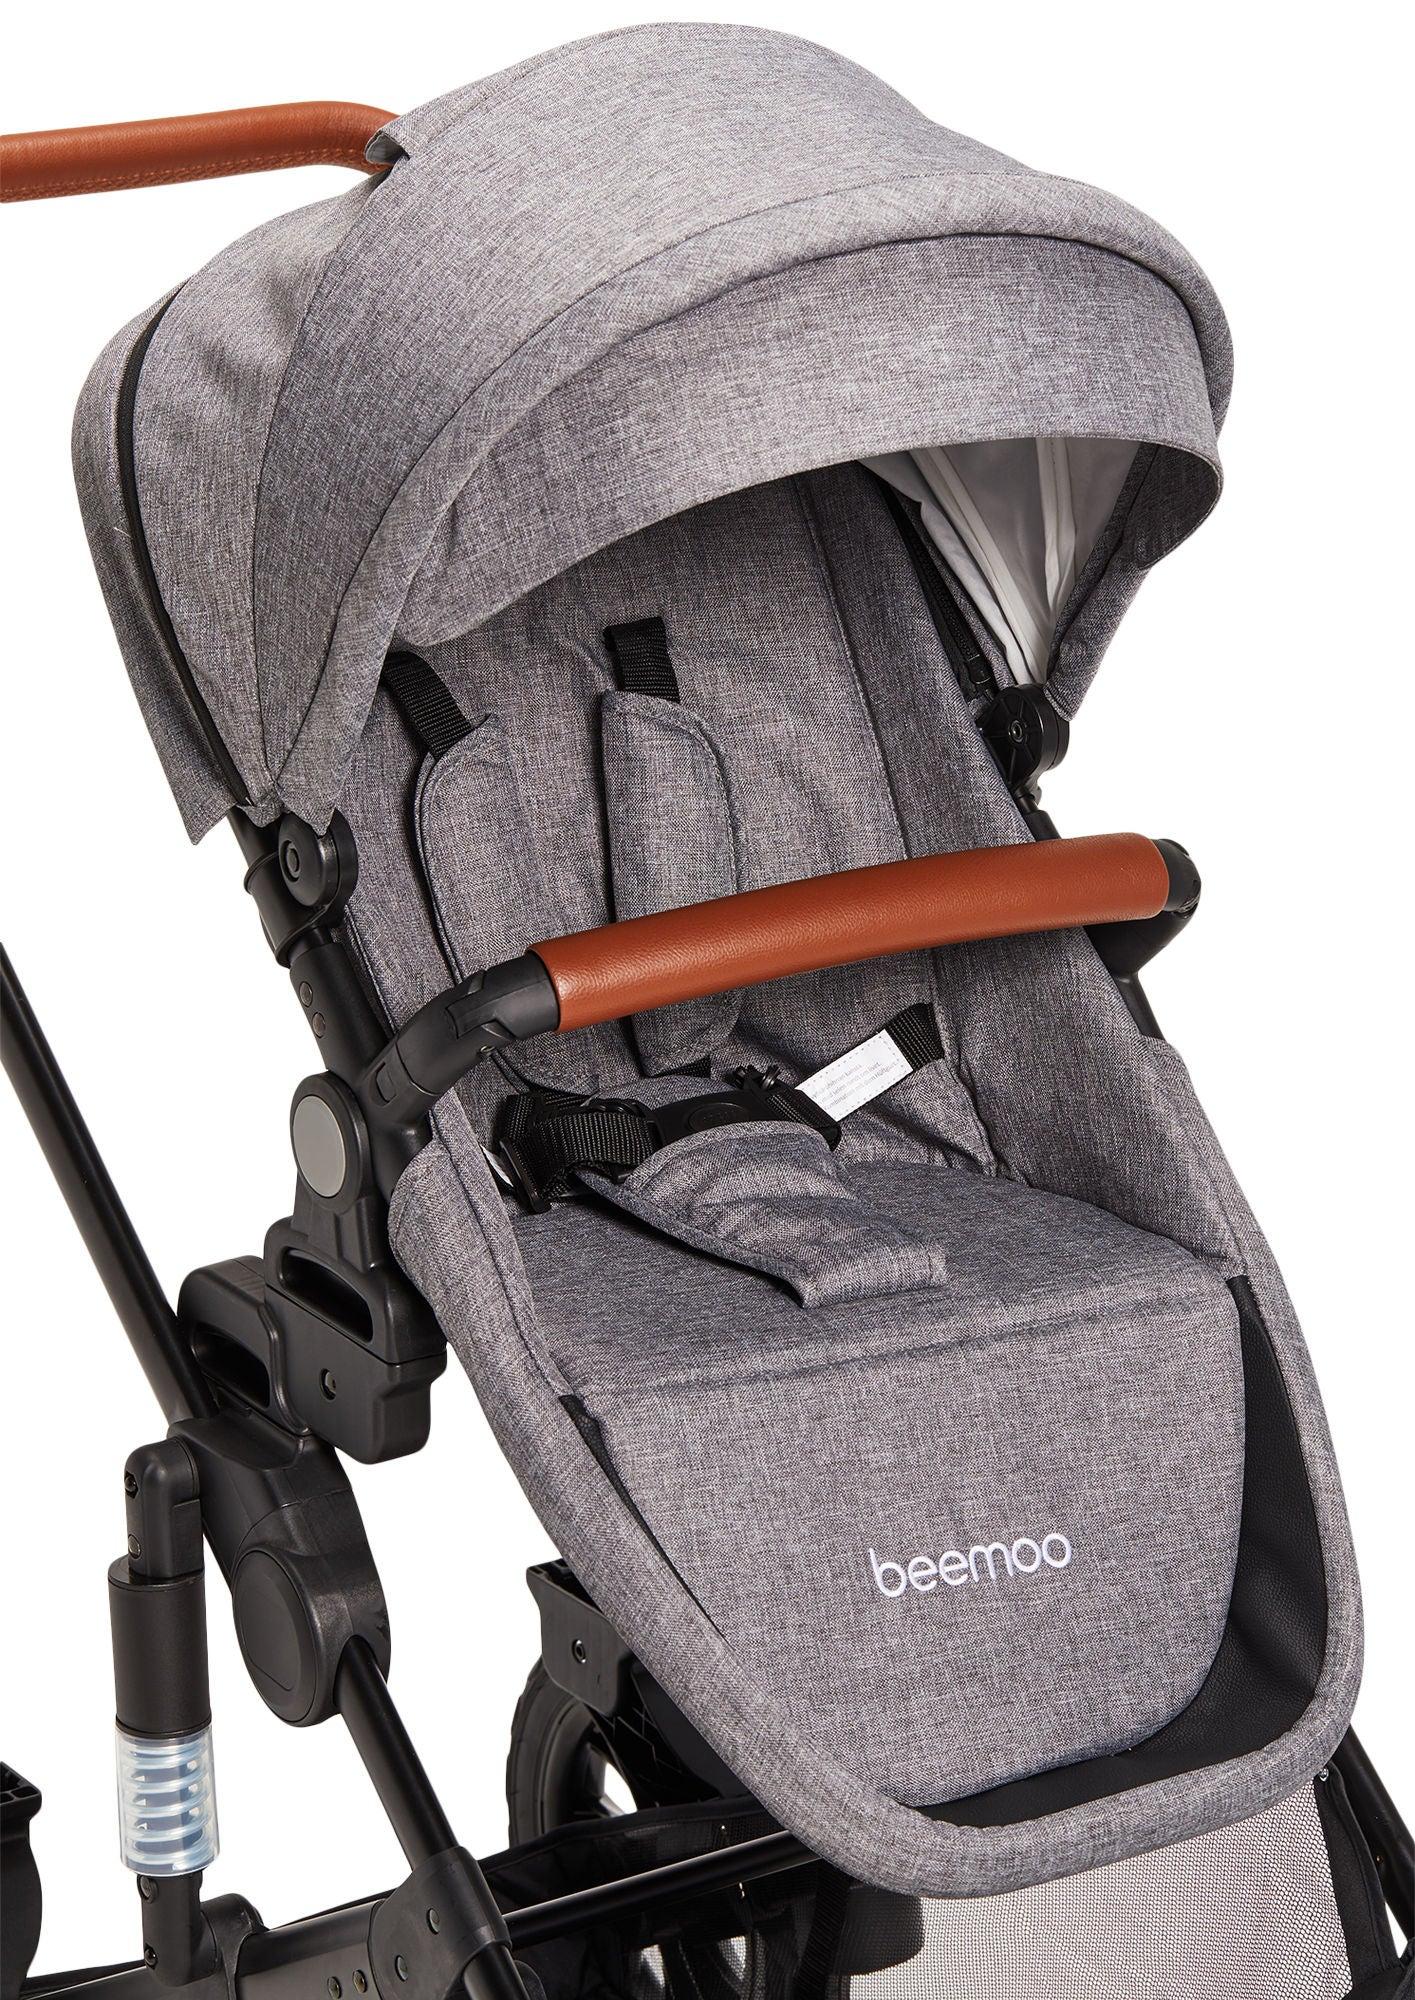 Beemoo Maxi 4 Sisarusistuin, Grey/Black